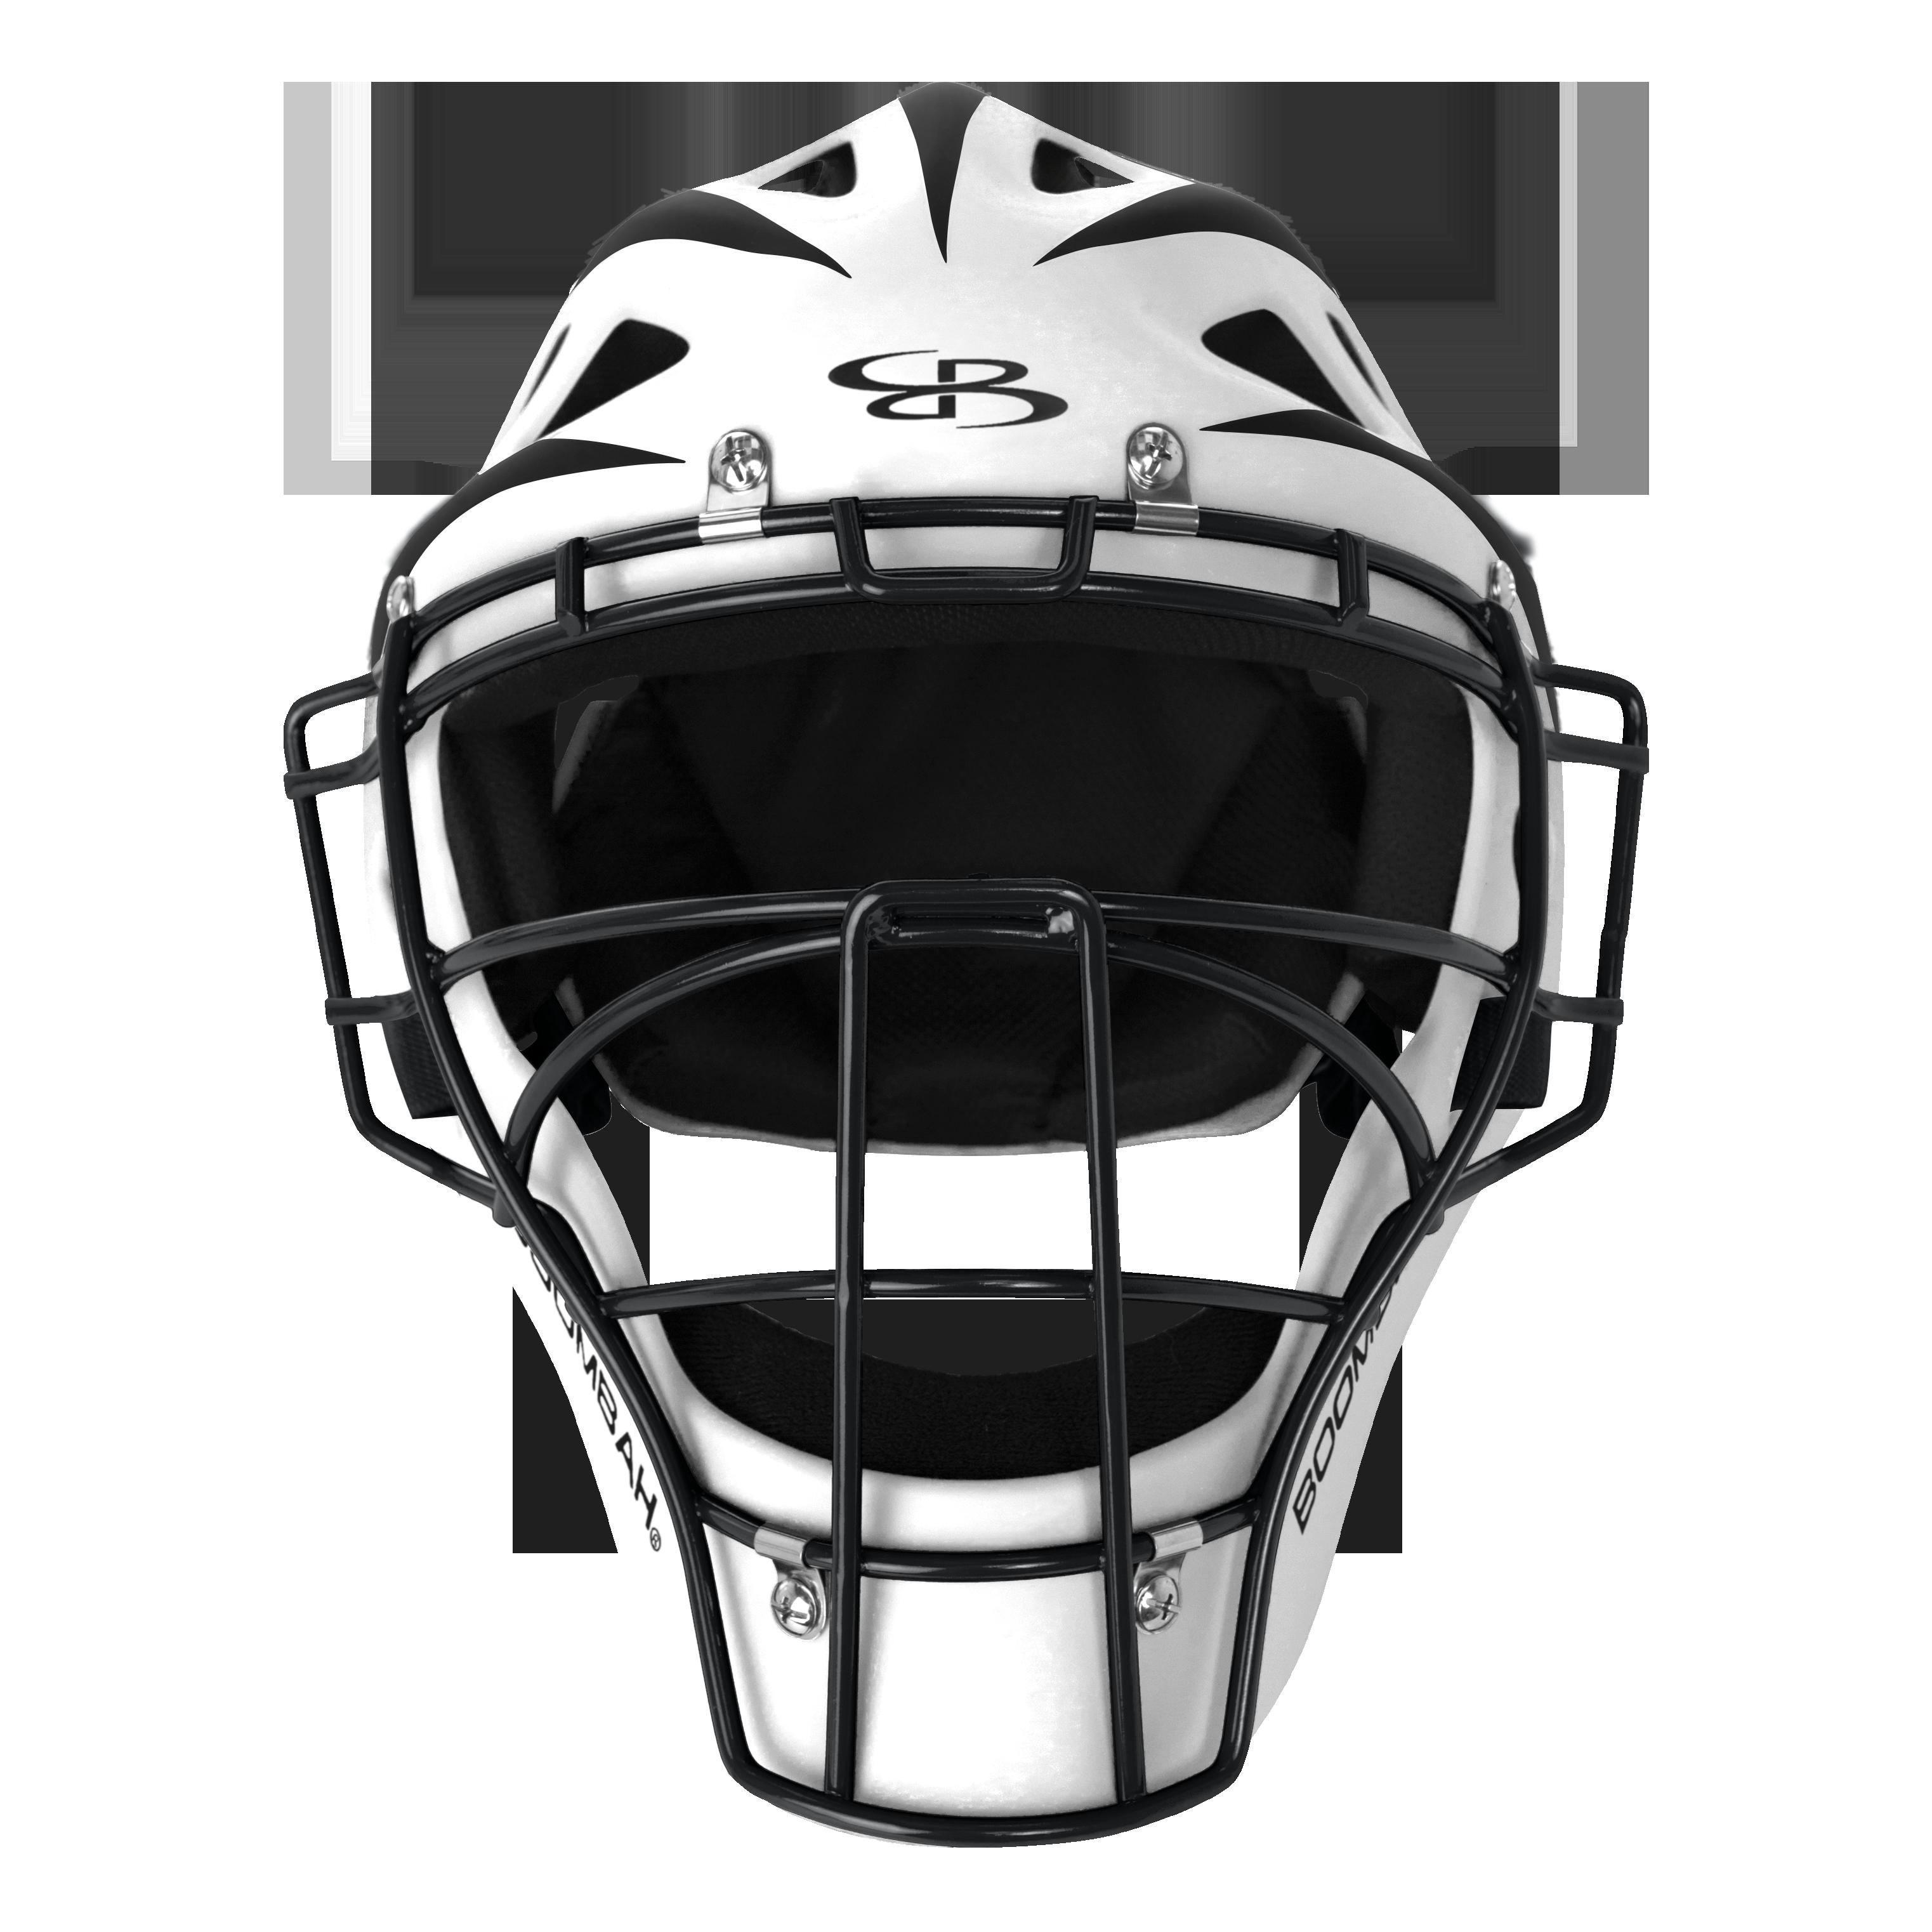 Defcon 2 0 Rubberized Matte Hockey Style Catchers Helmet Matte Out Boombah Boombahdiamondsports Boombahequipment Helmet Brands Helmet Batting Helmet